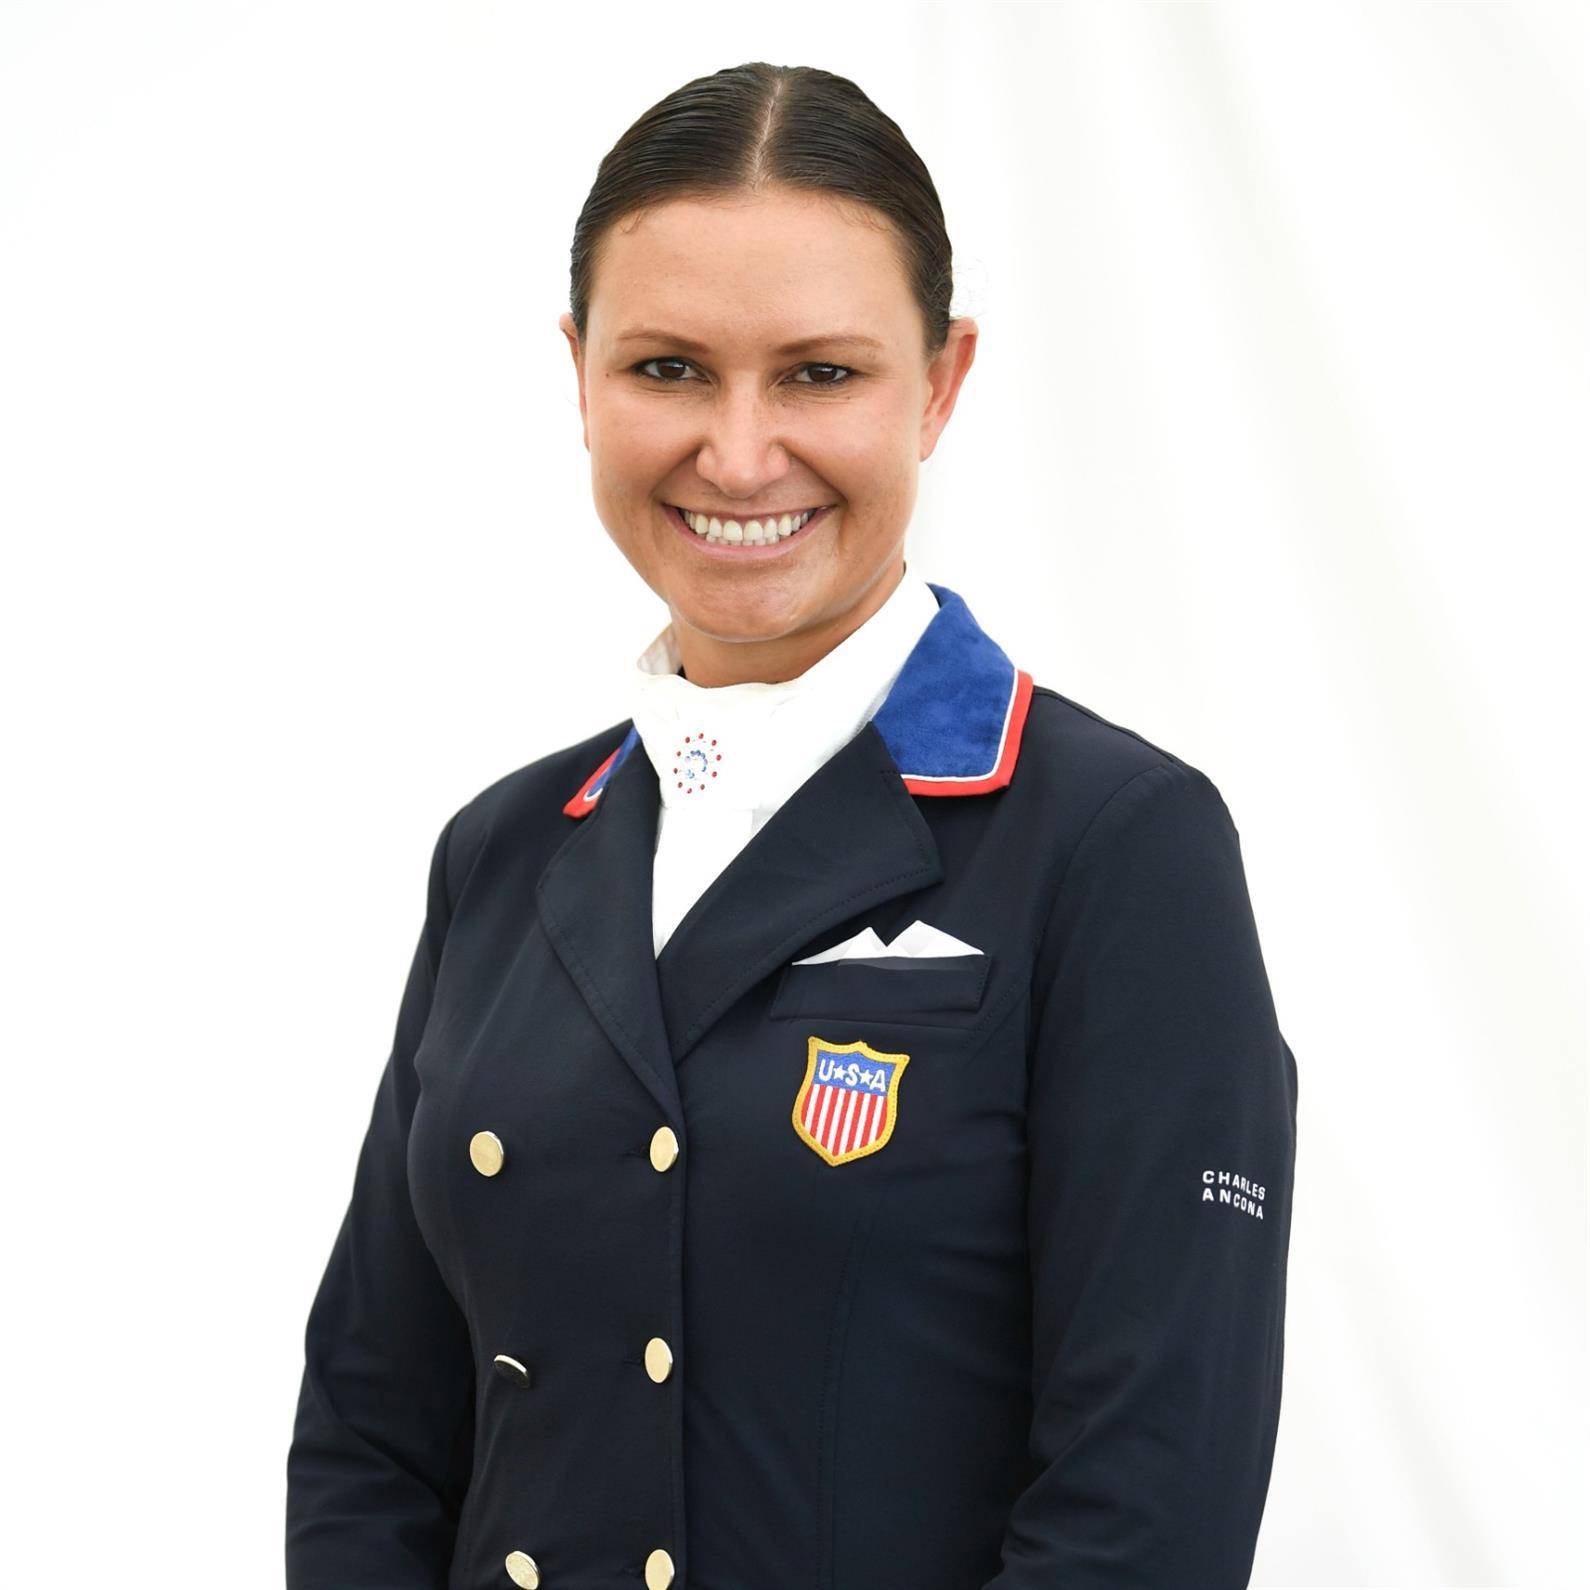 Adrienne Lyle